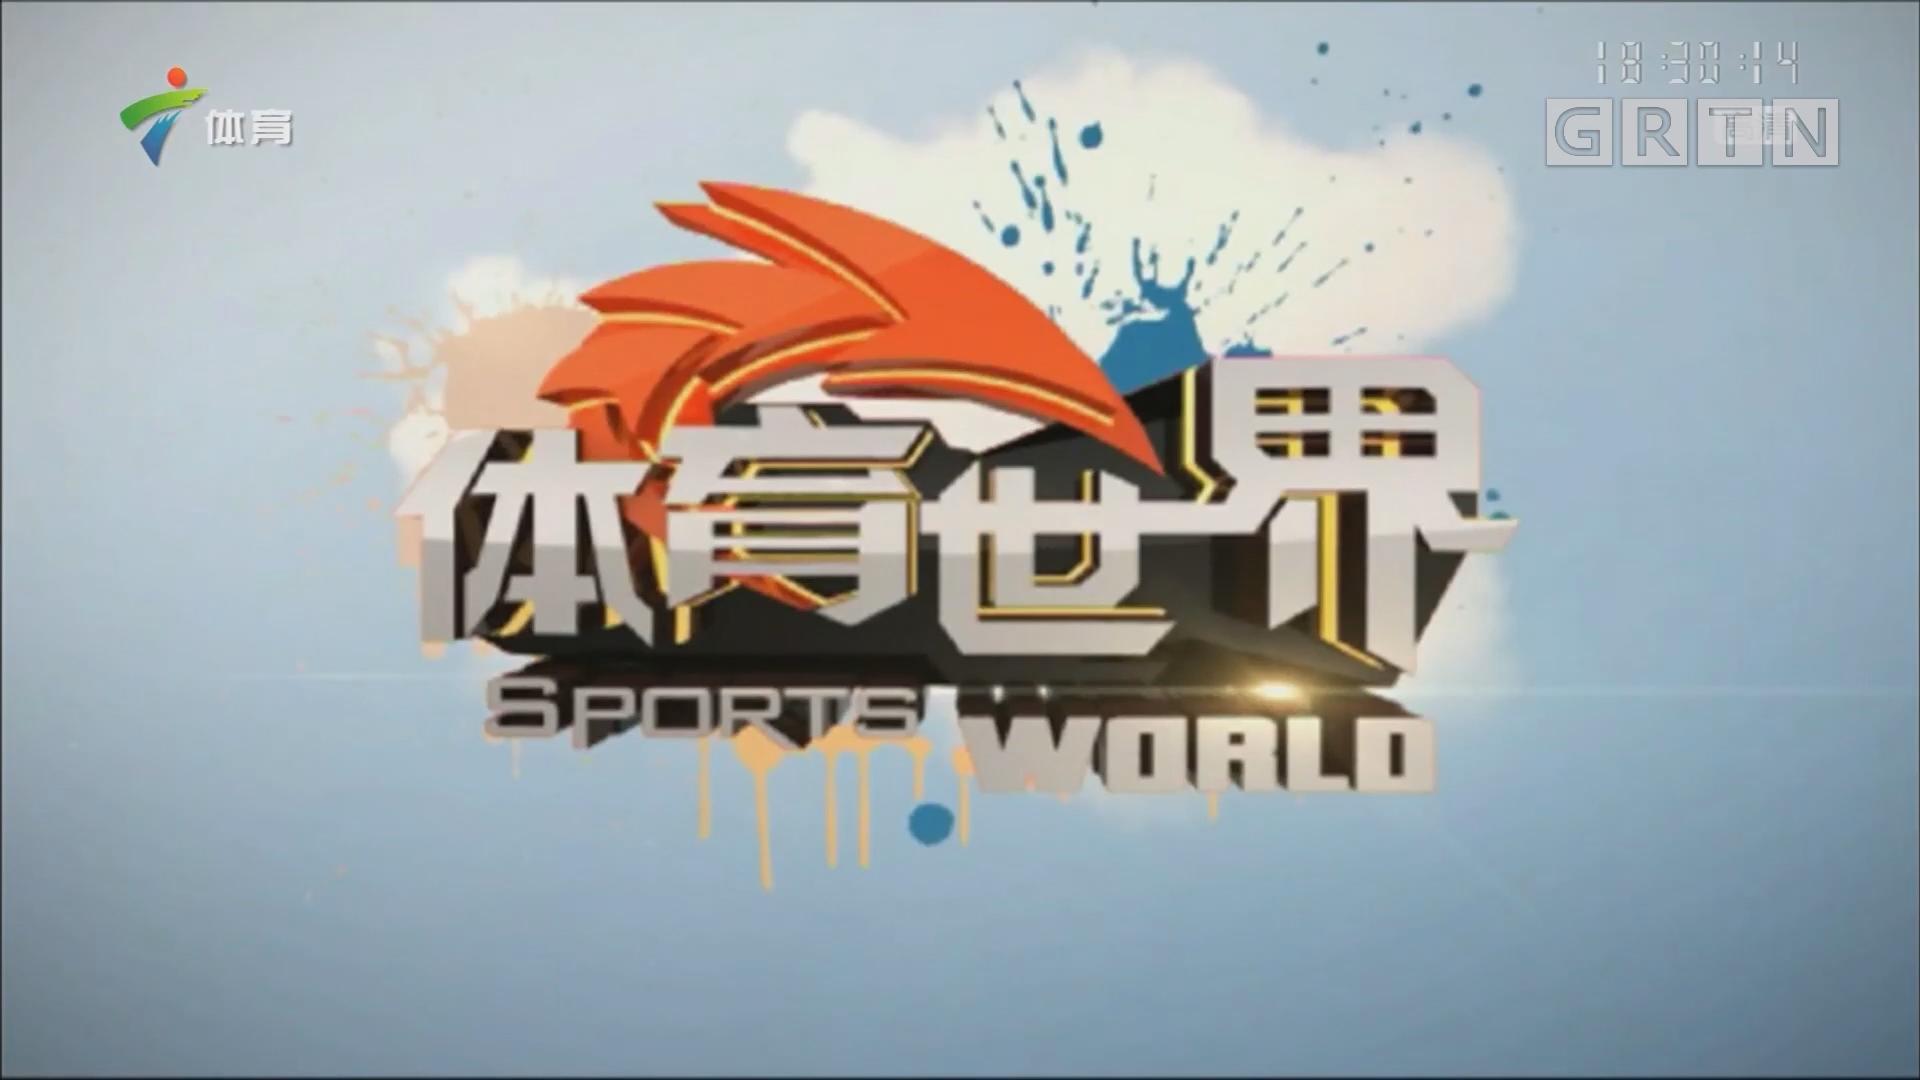 [HD][2017-11-06]体育世界:全球4大湾区网球青年齐聚珠海 上演青春对决